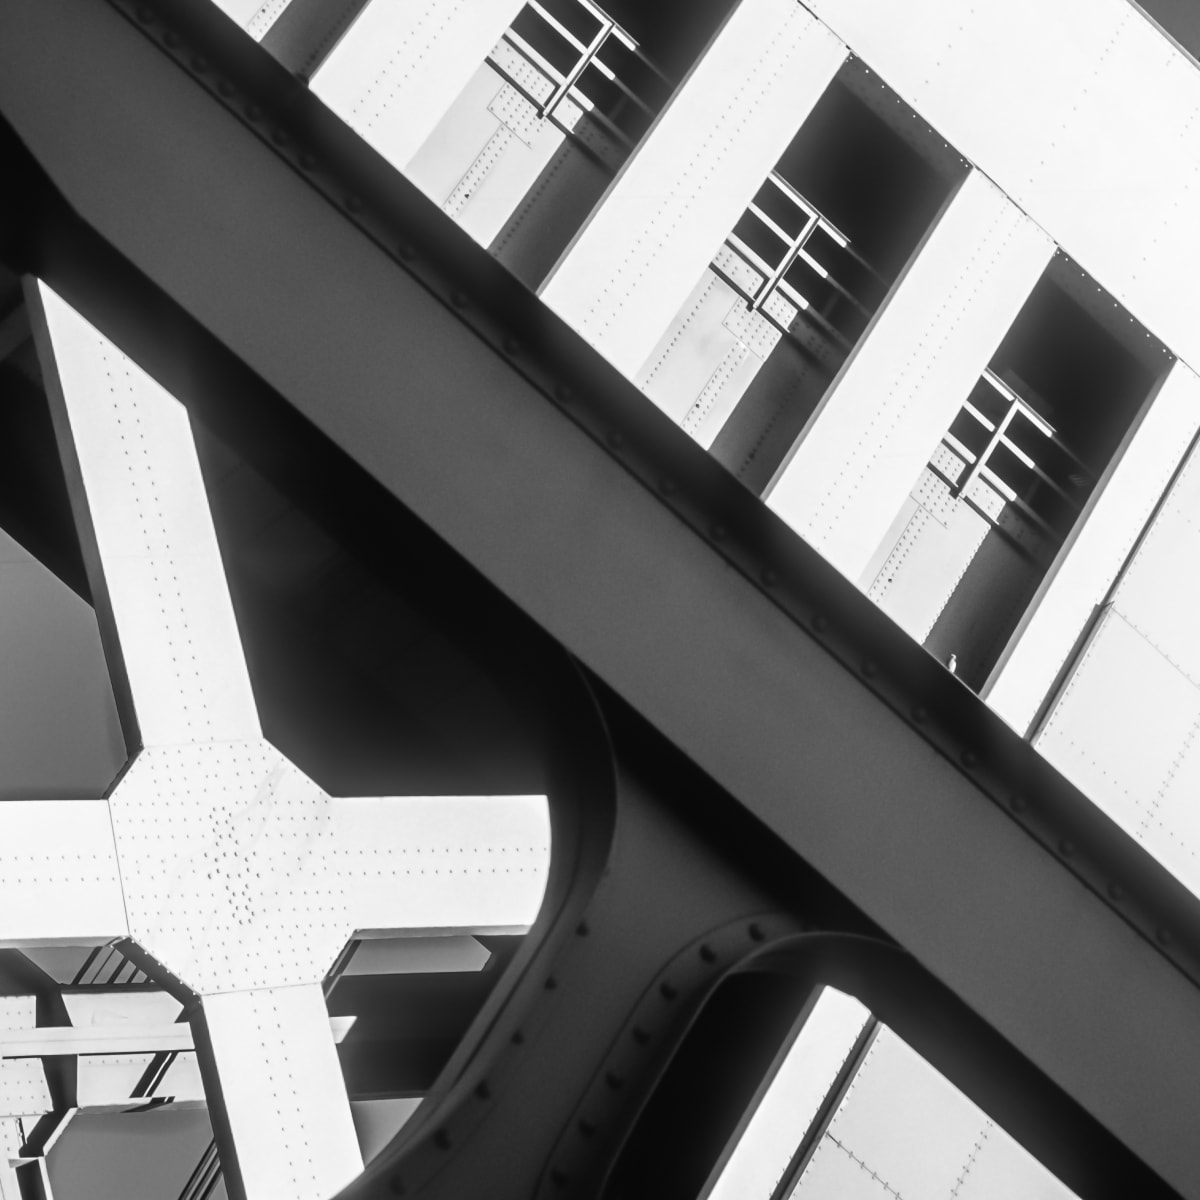 Tower Bridge #3 by Farrell Scott